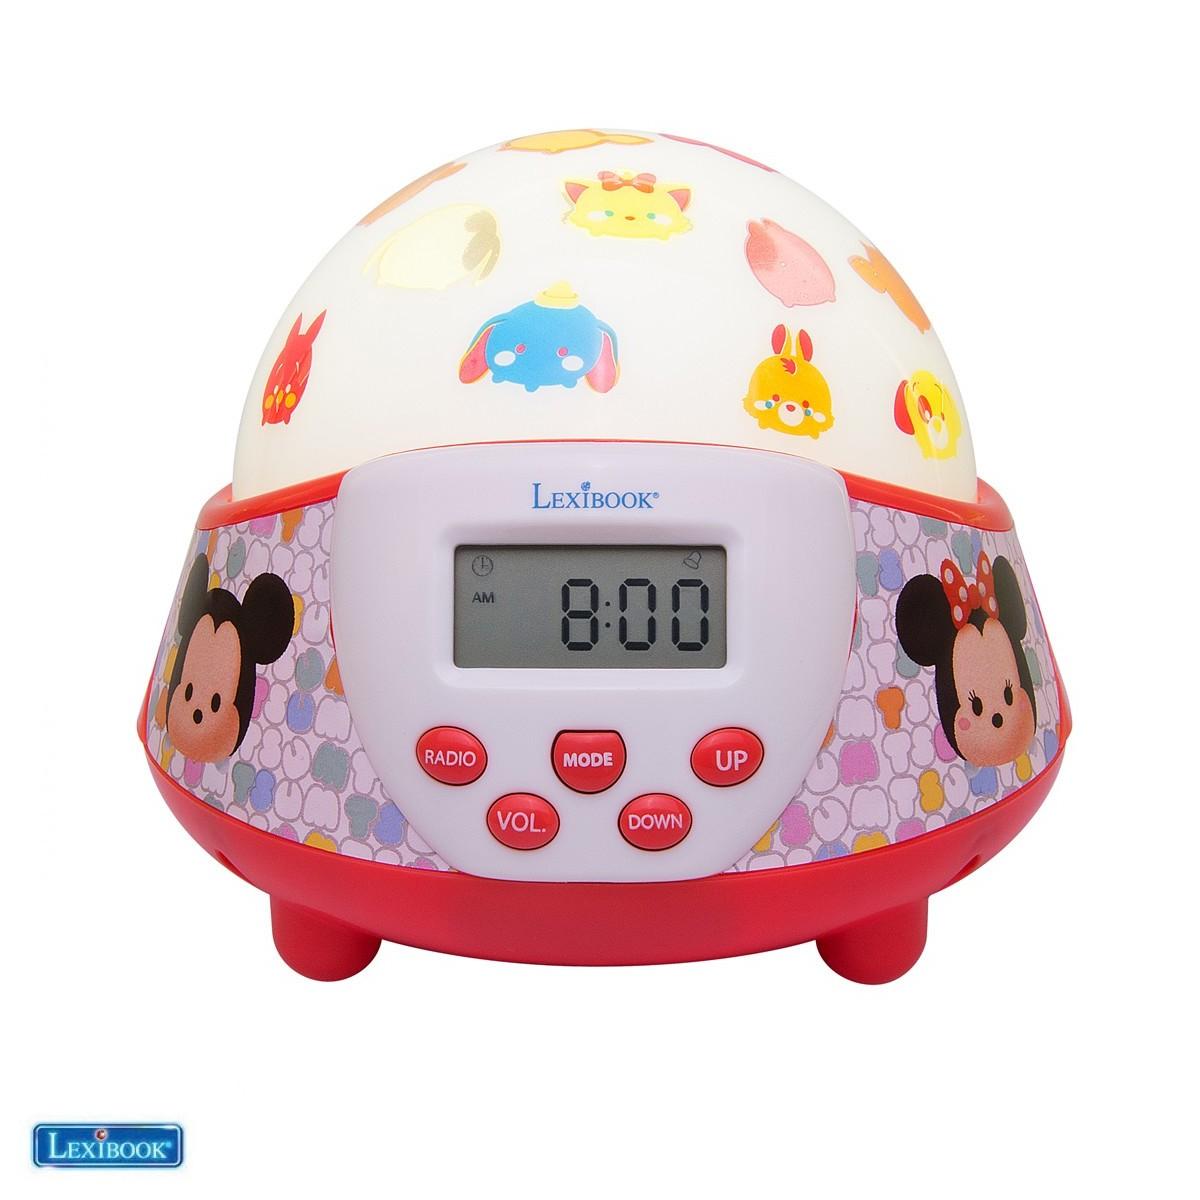 Radio réveil Tsum Tsum avec dôme projecteur veilleuse - Lexibook NLJ140TT-00